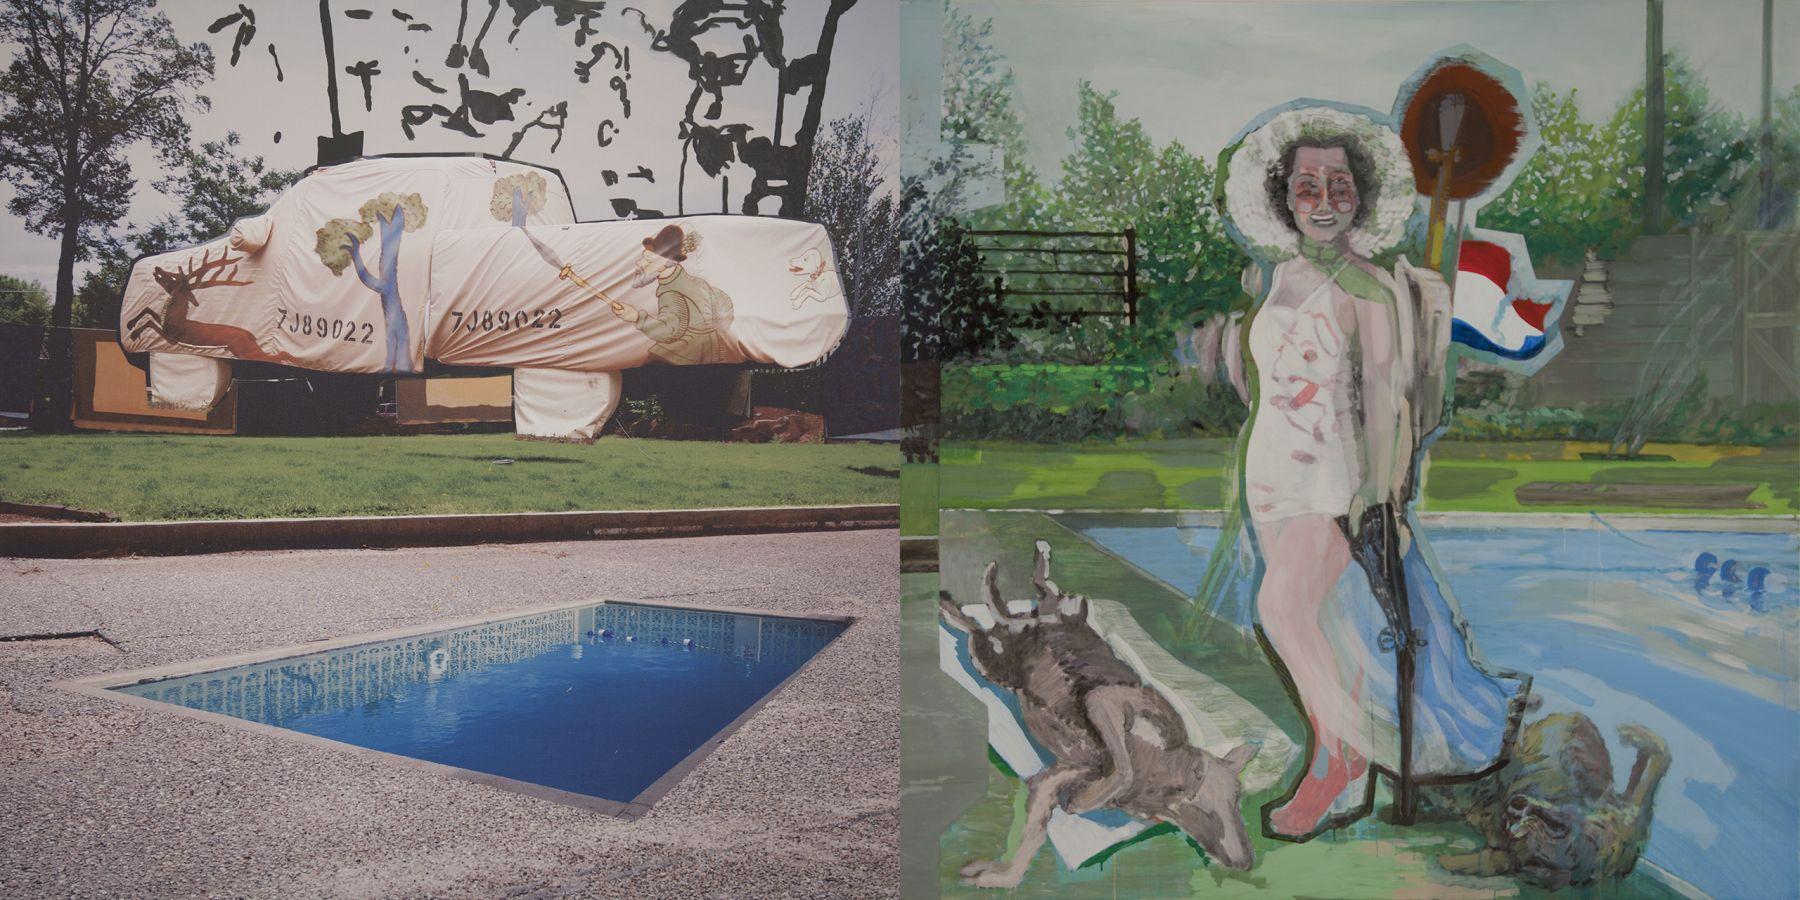 24. Hunted, 2009-2010, acrylic/tempera/oil/print/canvas, 200 x 400 cm